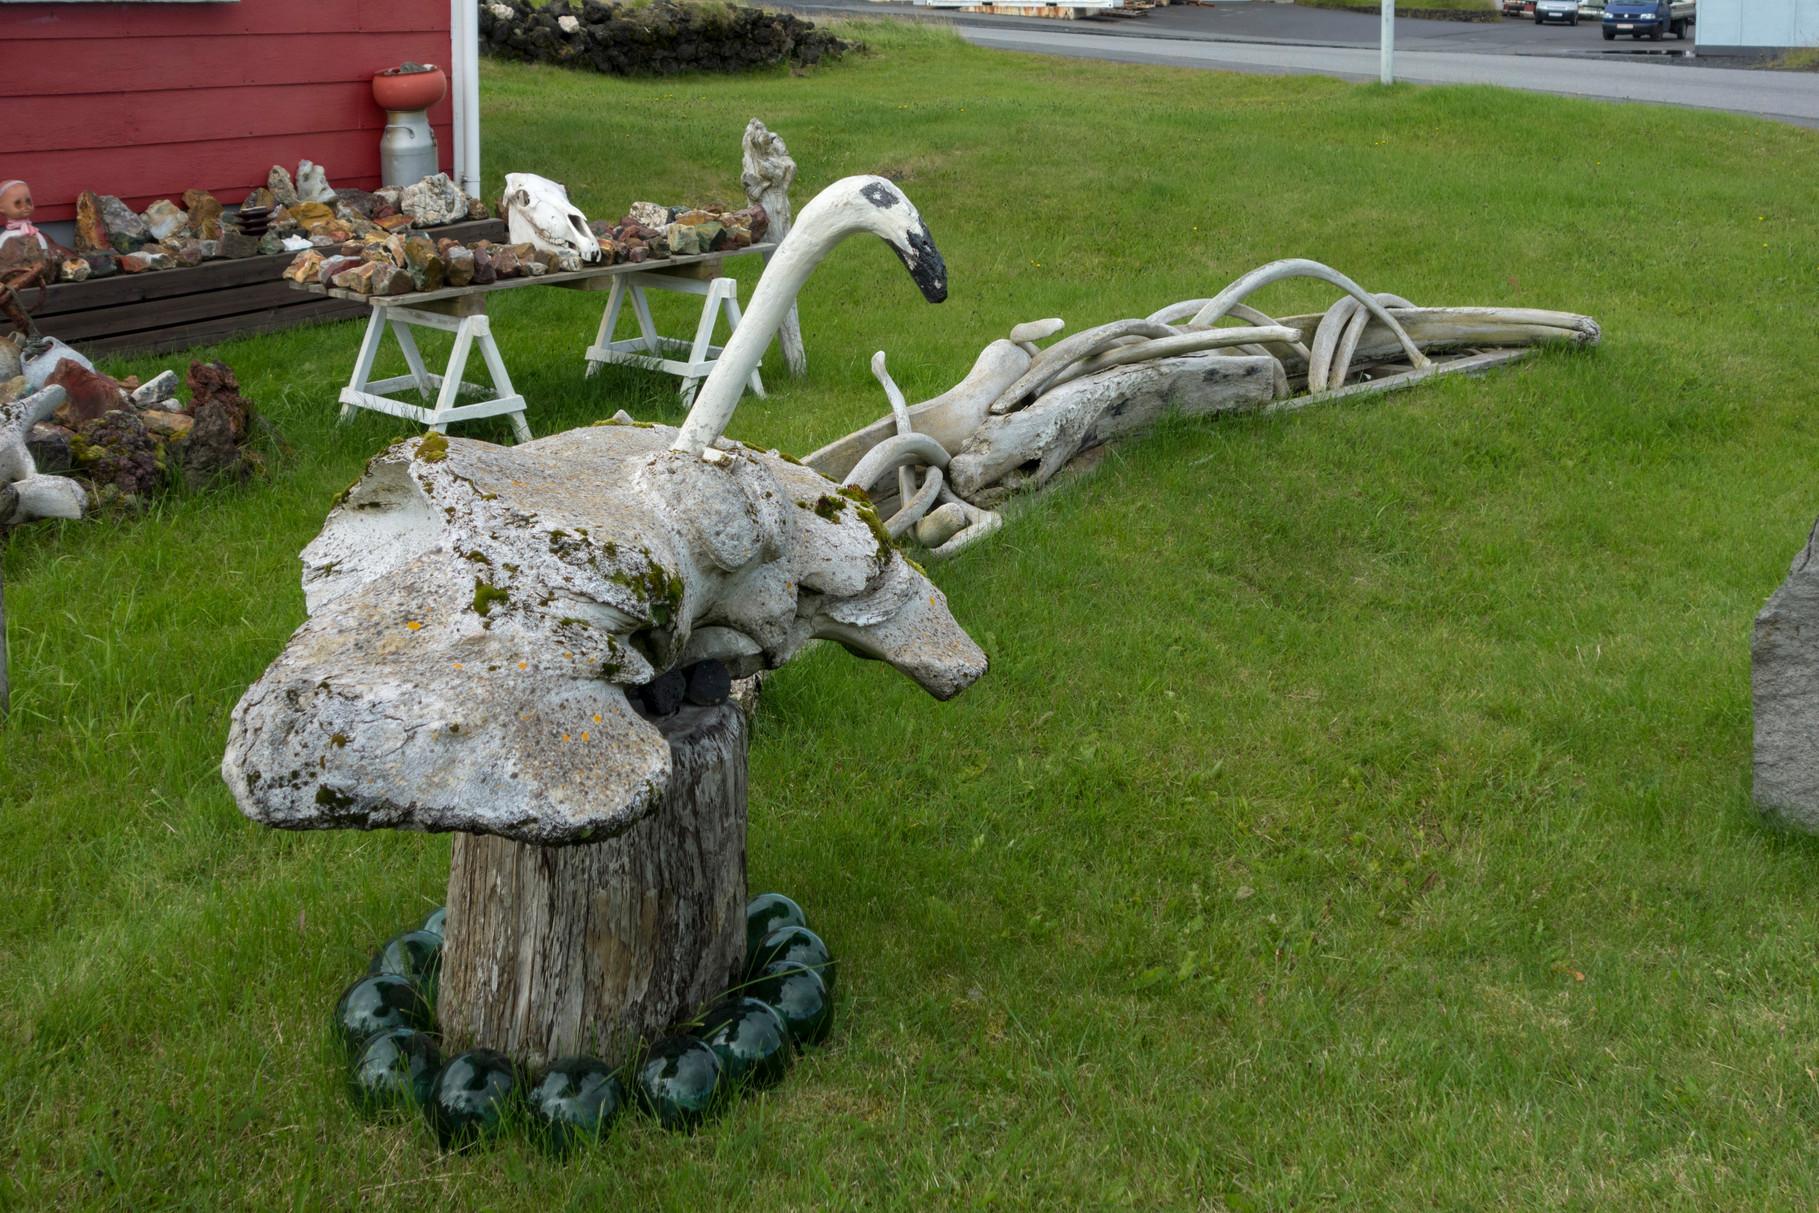 Phantasiegebilde aus Walfischknochen